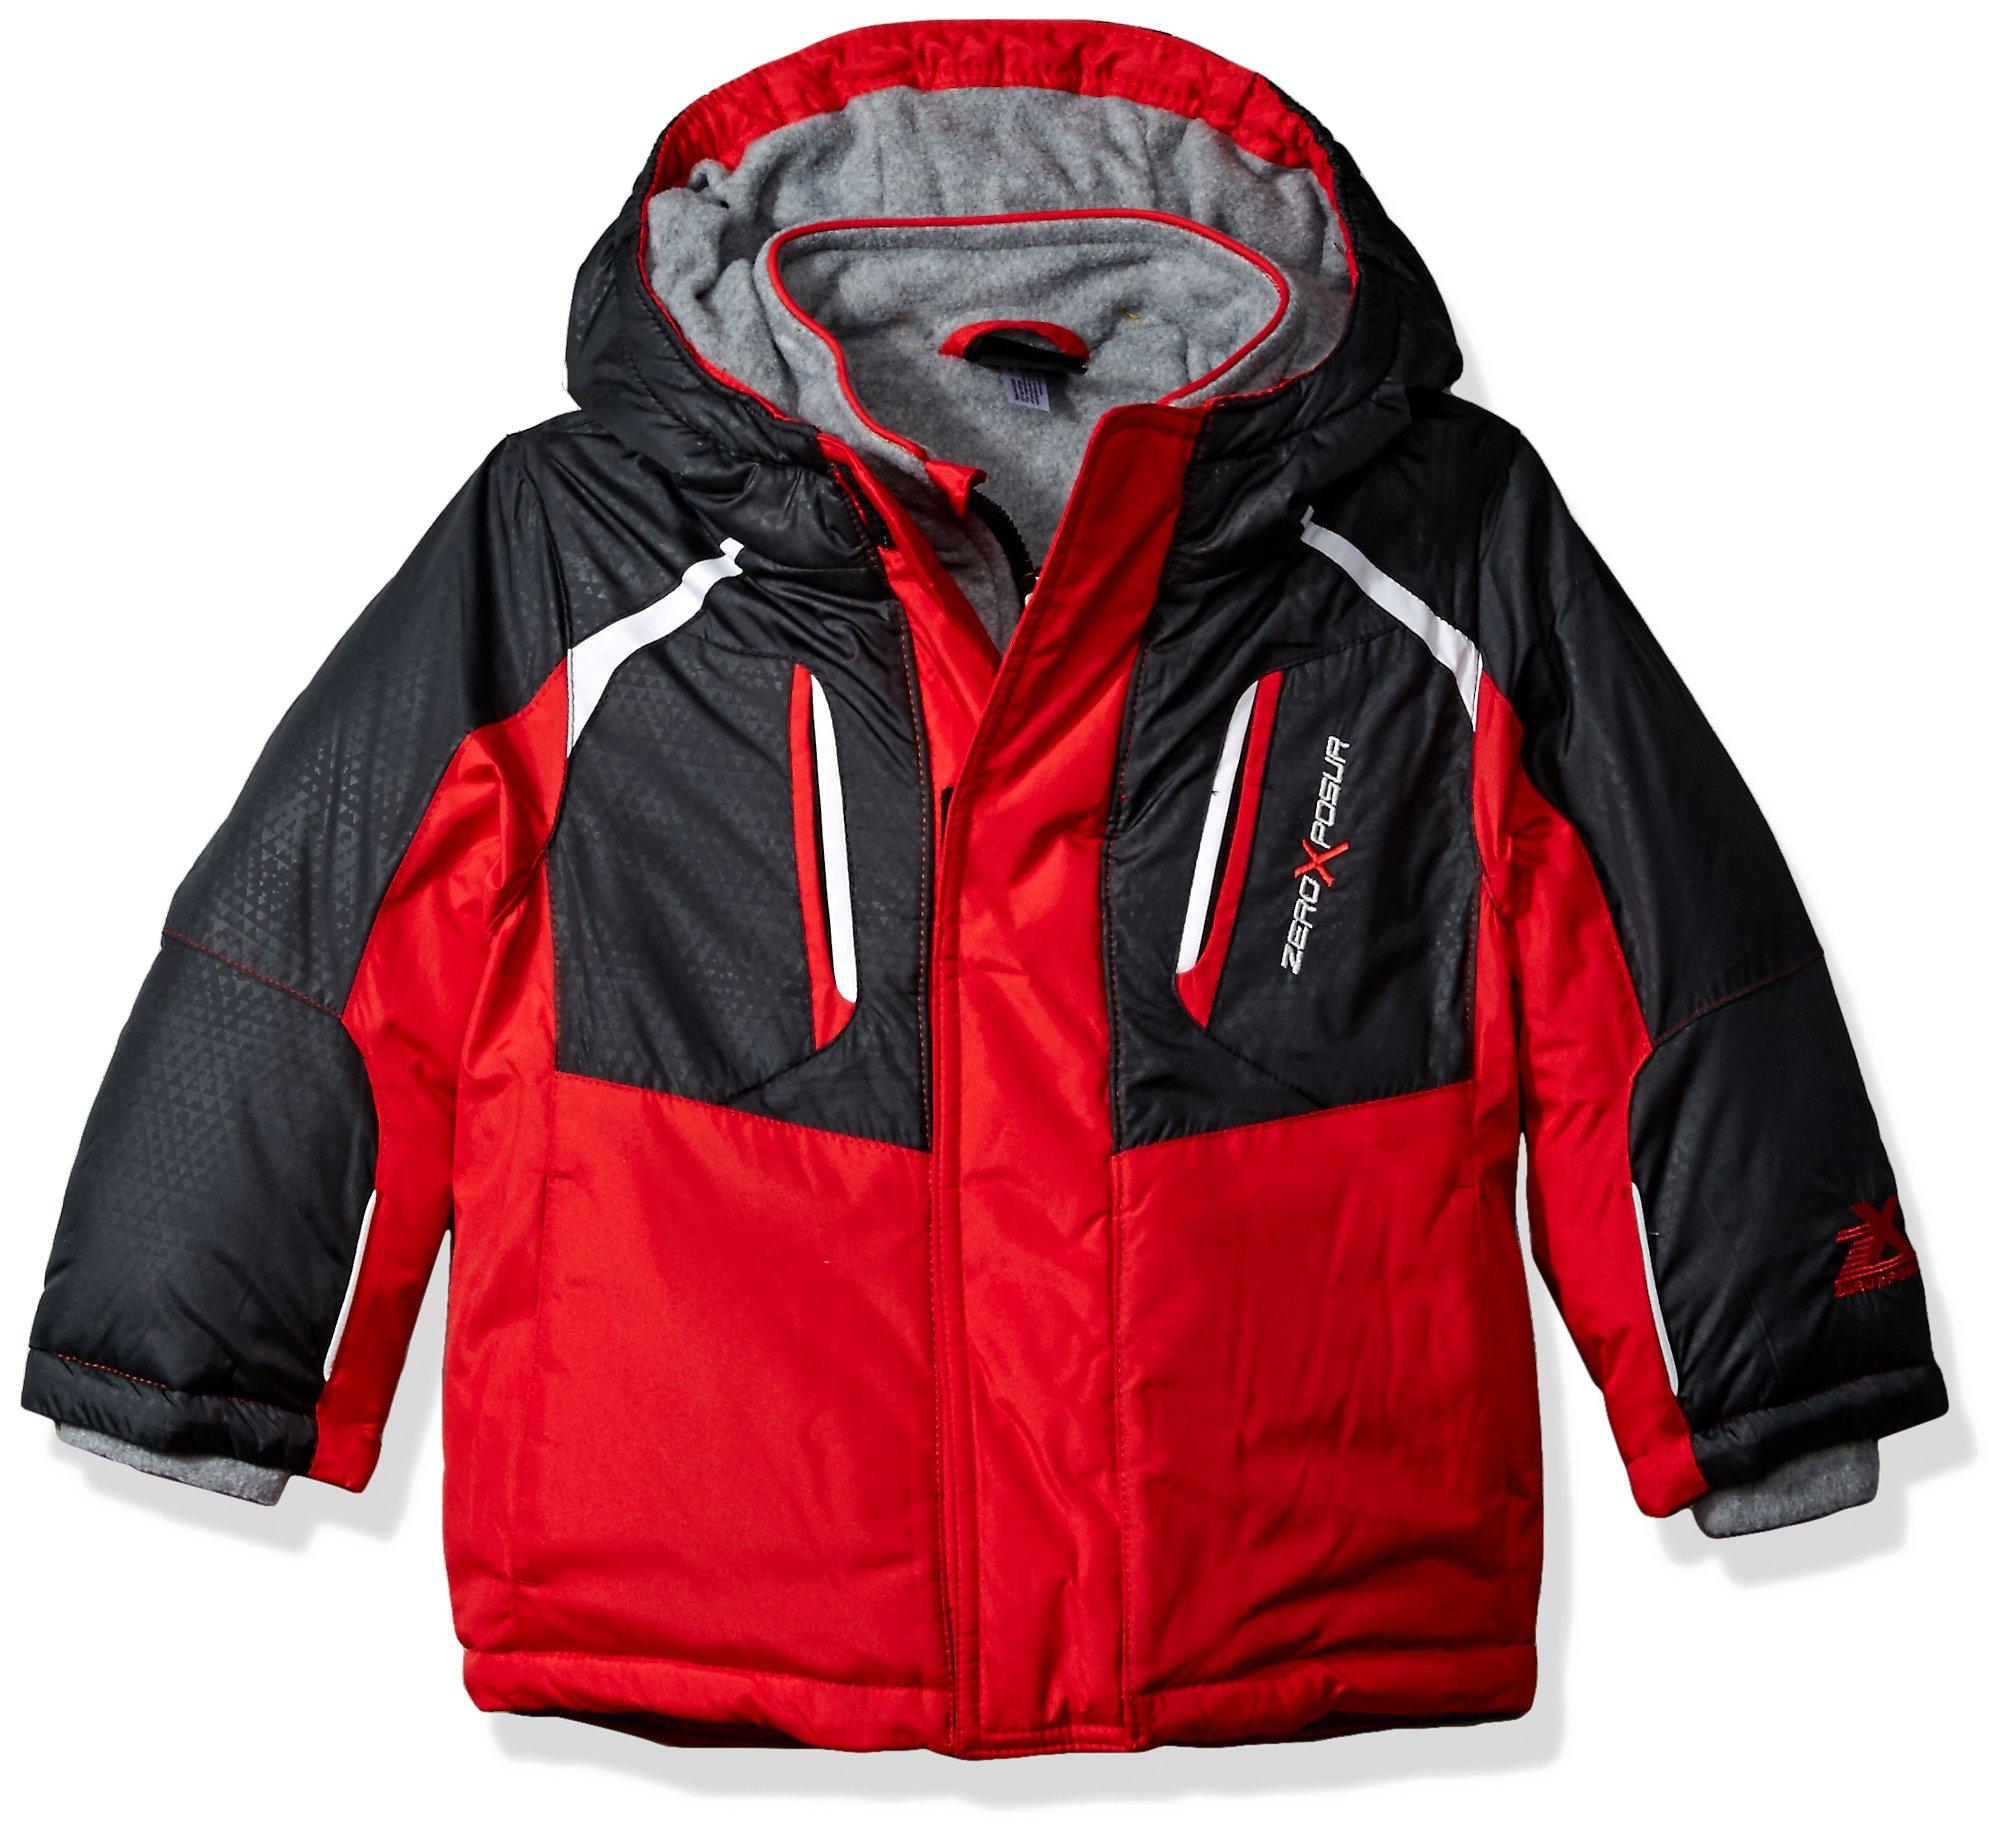 ZeroXposur Toddler Boys' Jake Heavyweight Jacket, Red, 2T